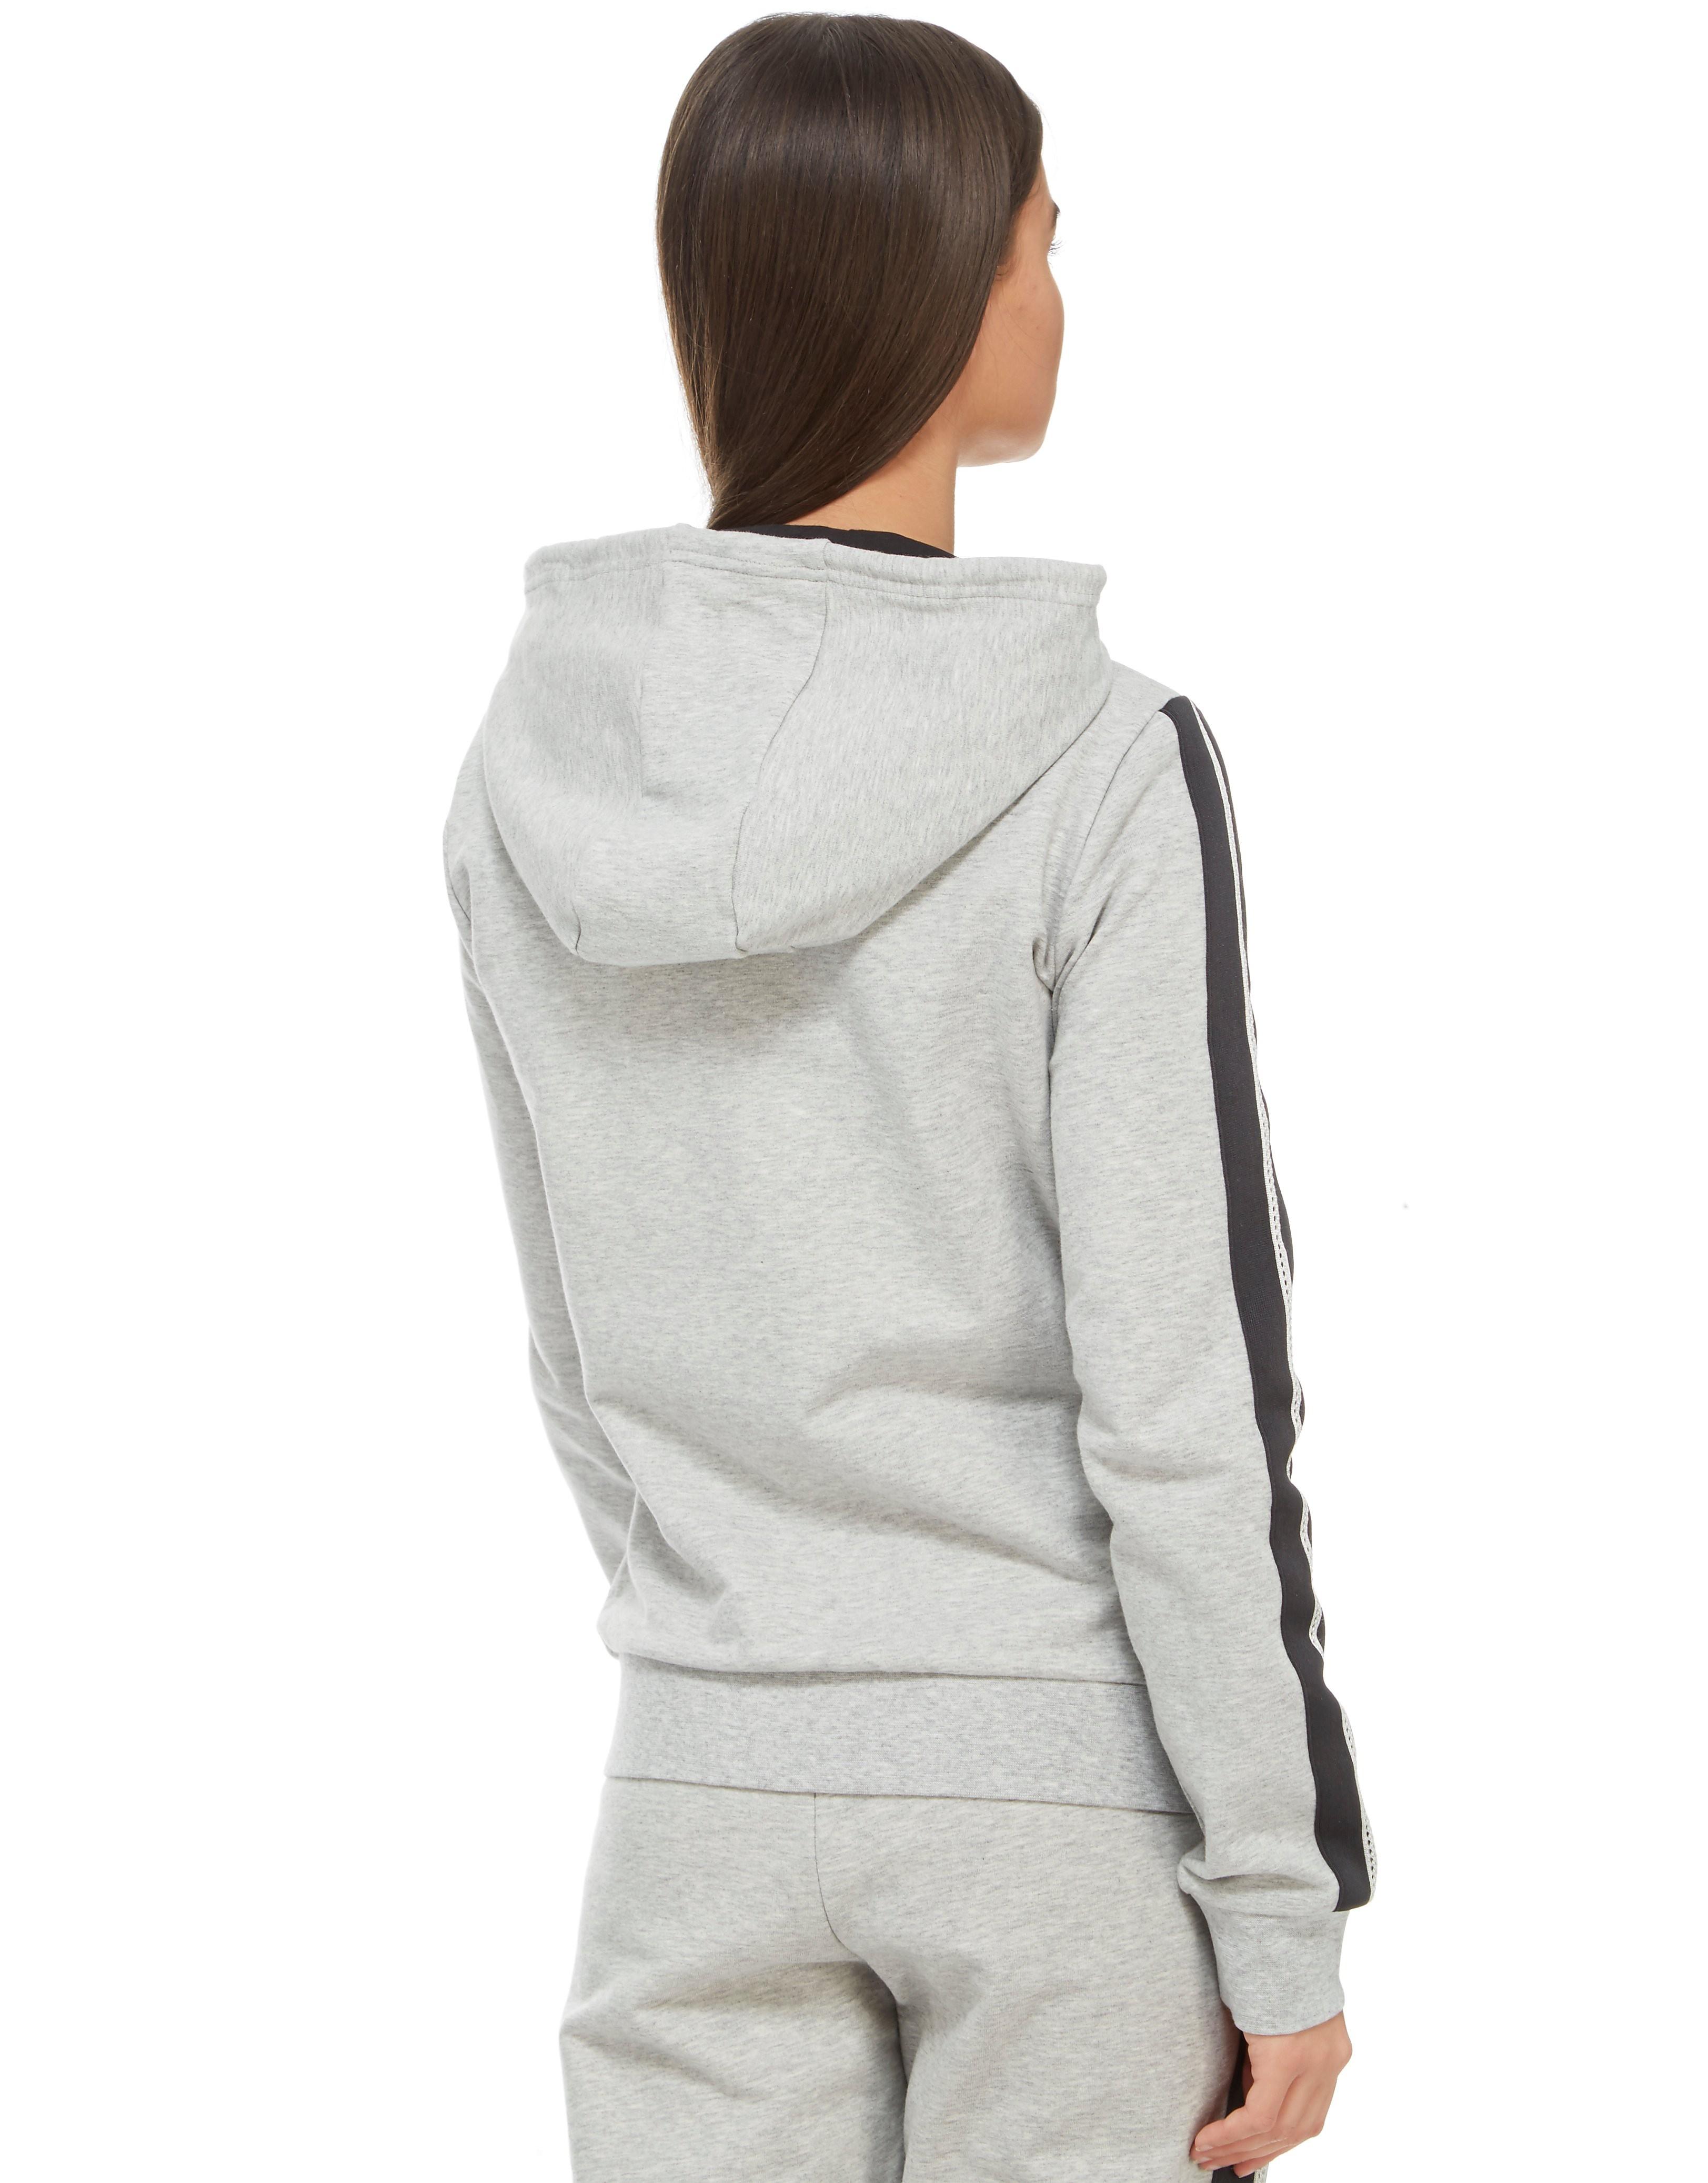 Emporio Armani EA7 Tape Fleece Full Zip Hoody